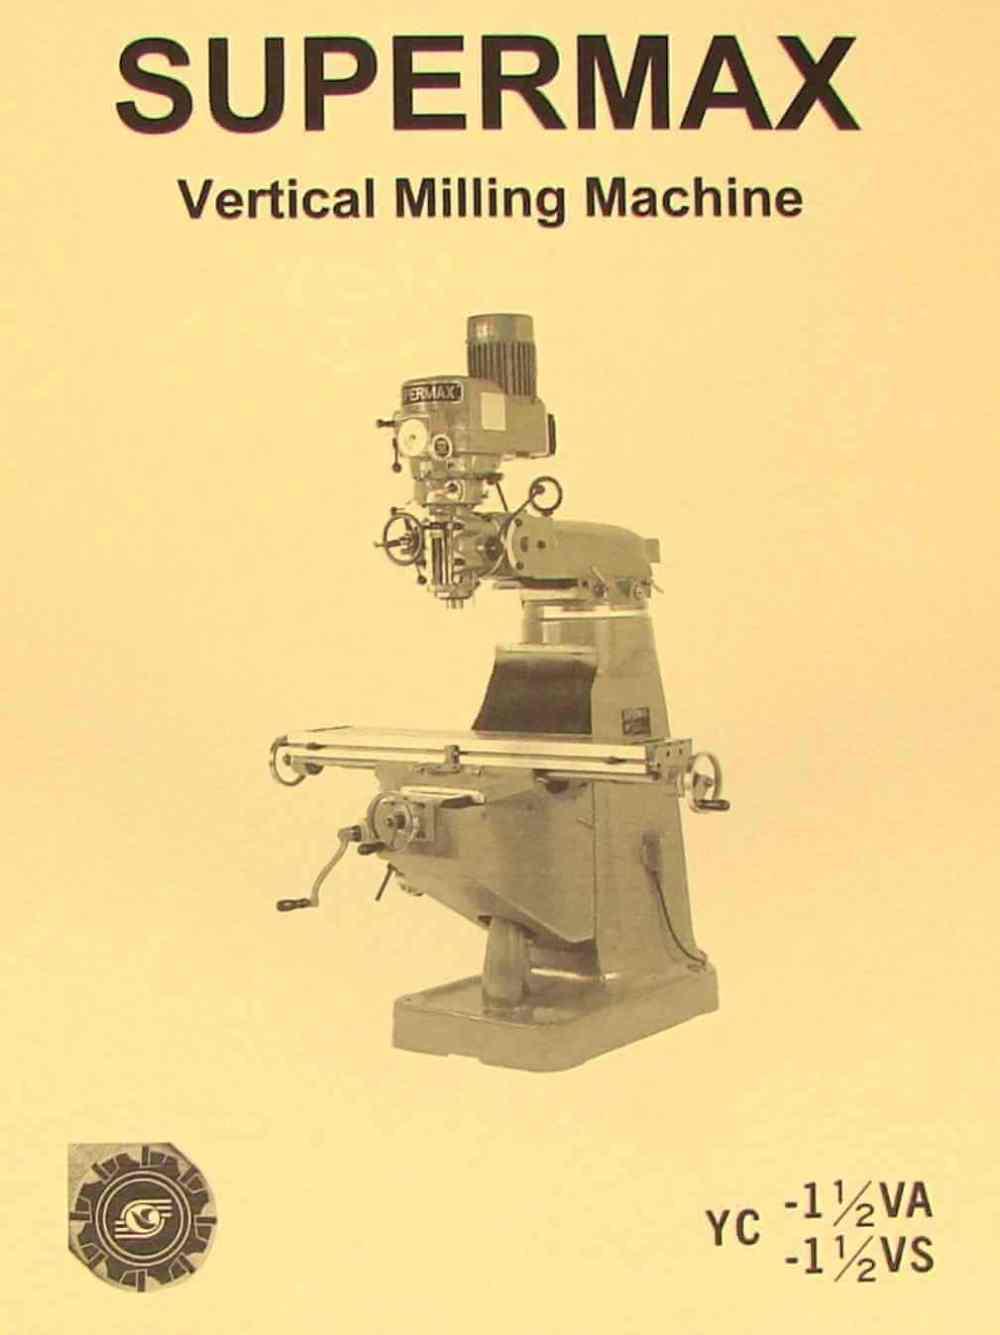 medium resolution of supermax yc 1 1 2 va vs vertical milling machine operating parts manual yc 1 1 2 va vs ozark tool manuals books